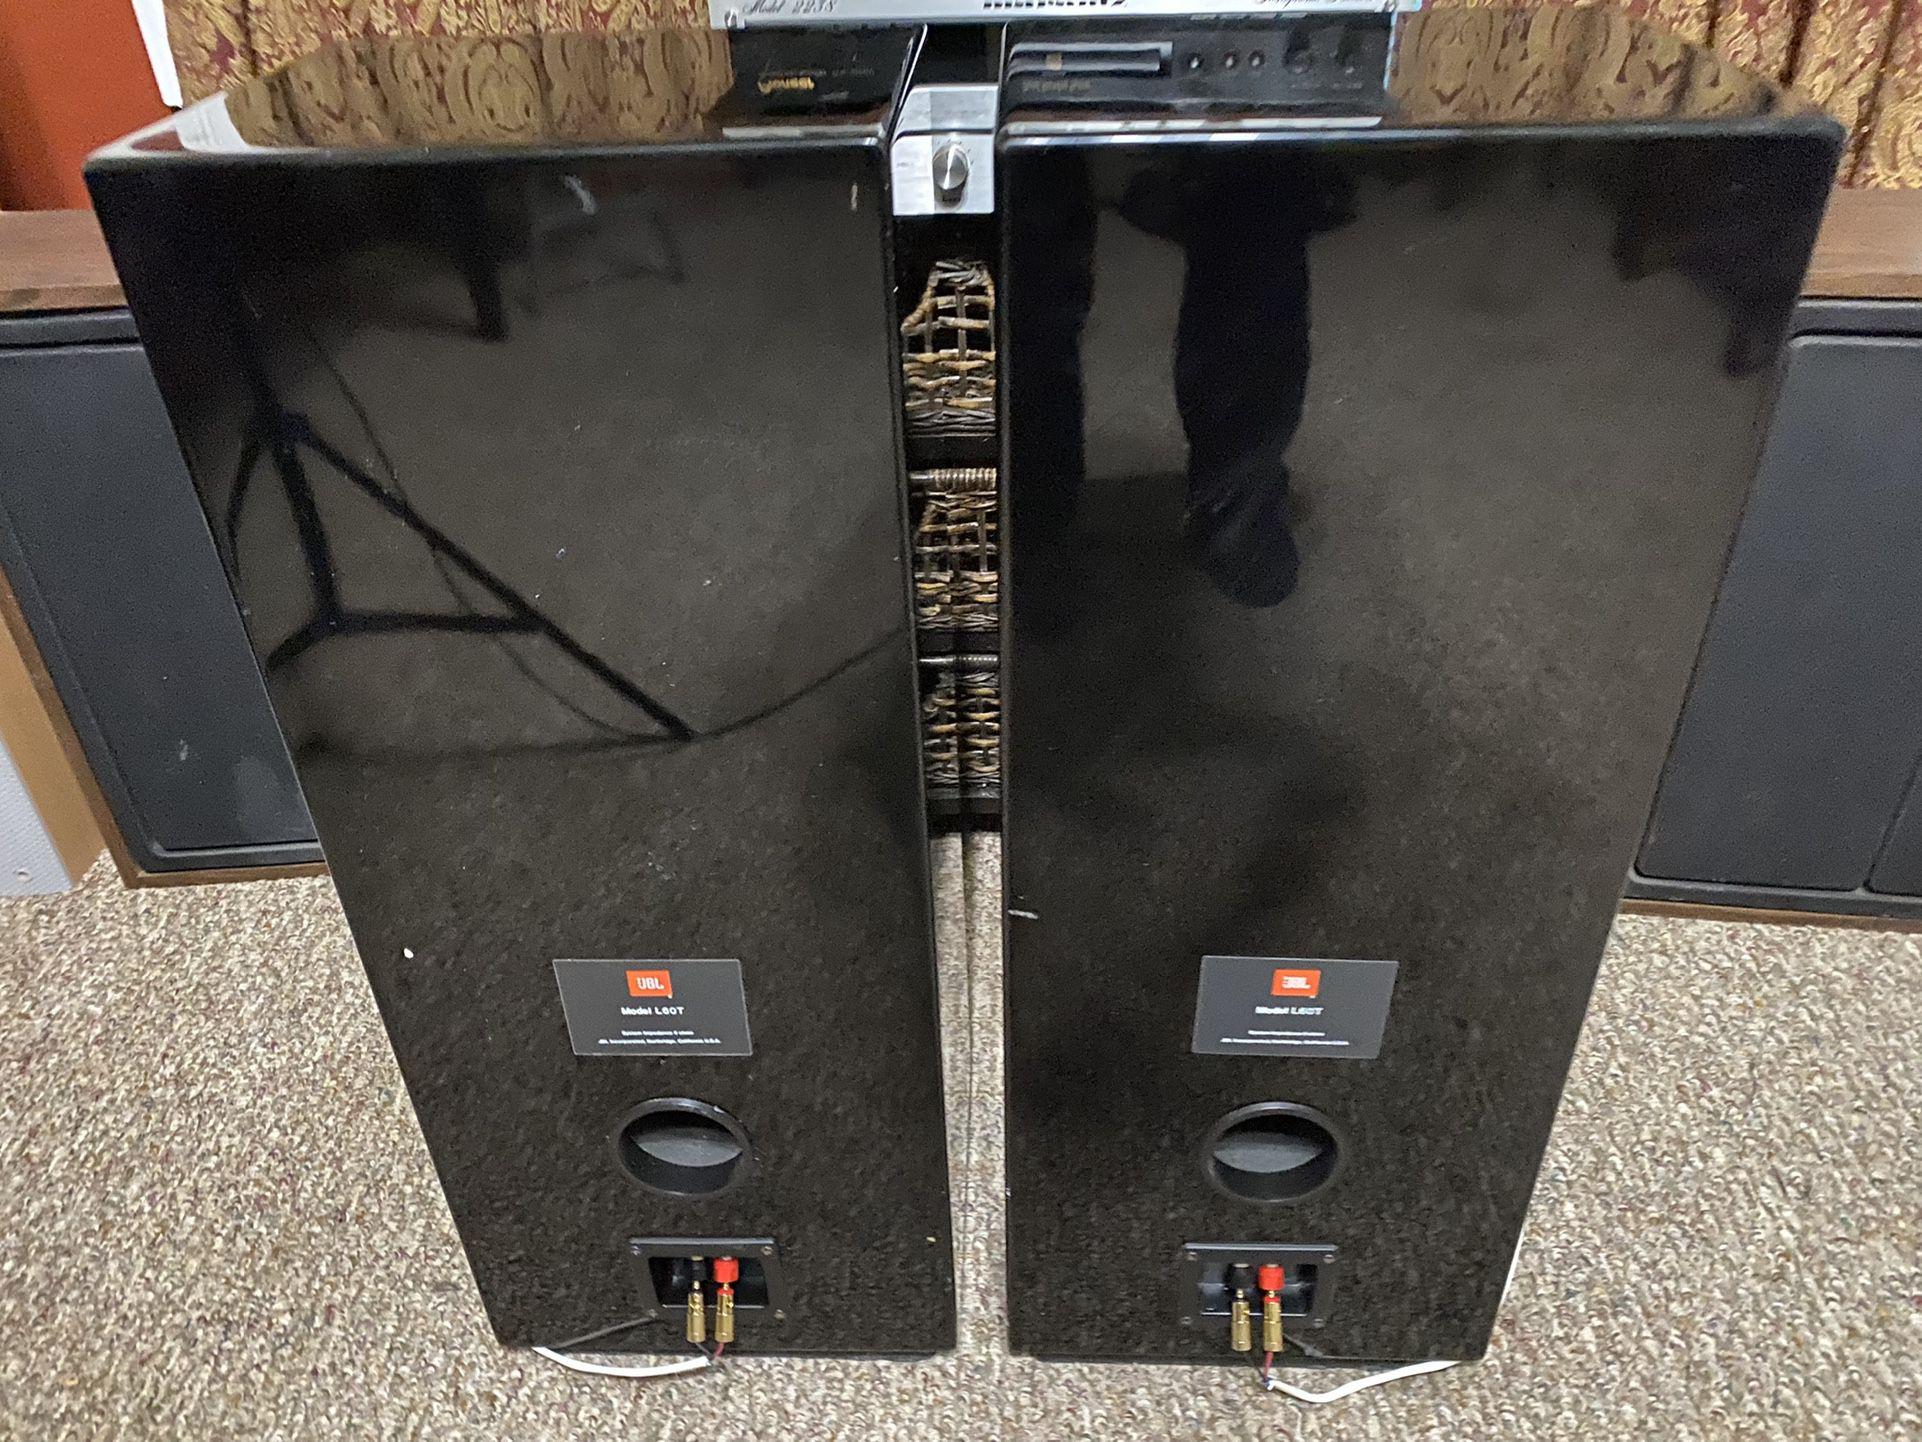 JBL Home Stereo Speakers